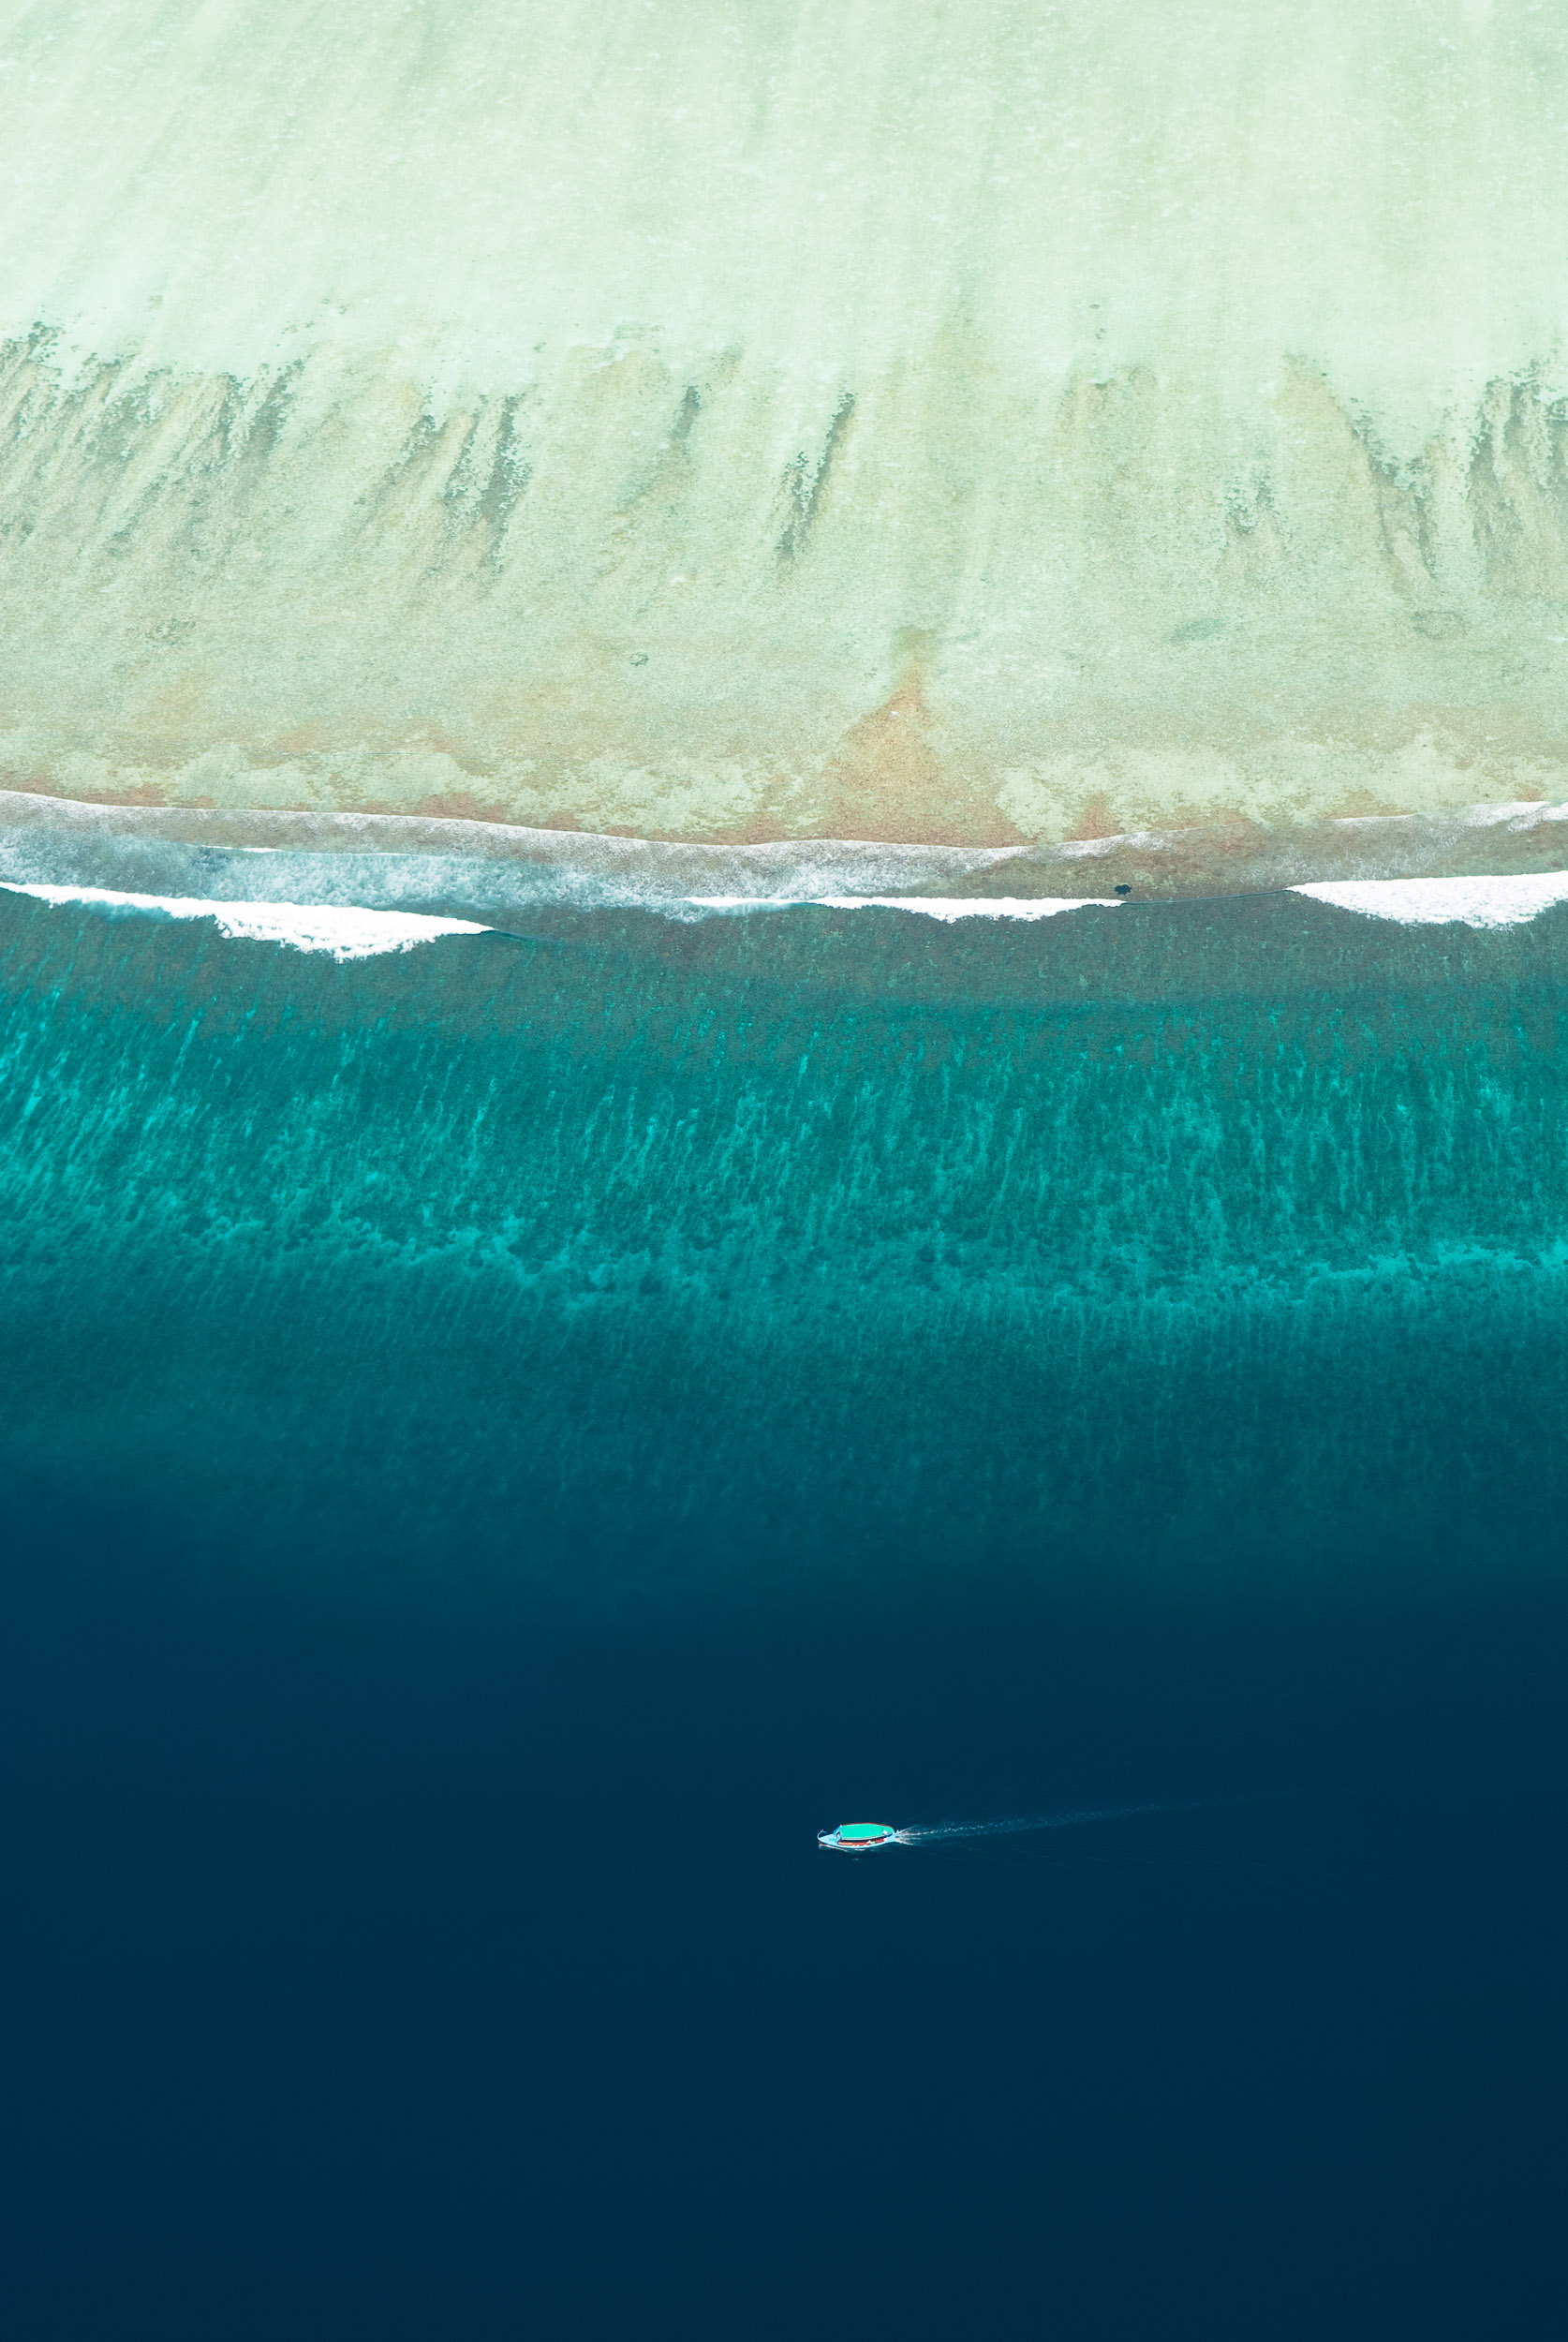 Maldives aerial. © www.thomaspickard.com